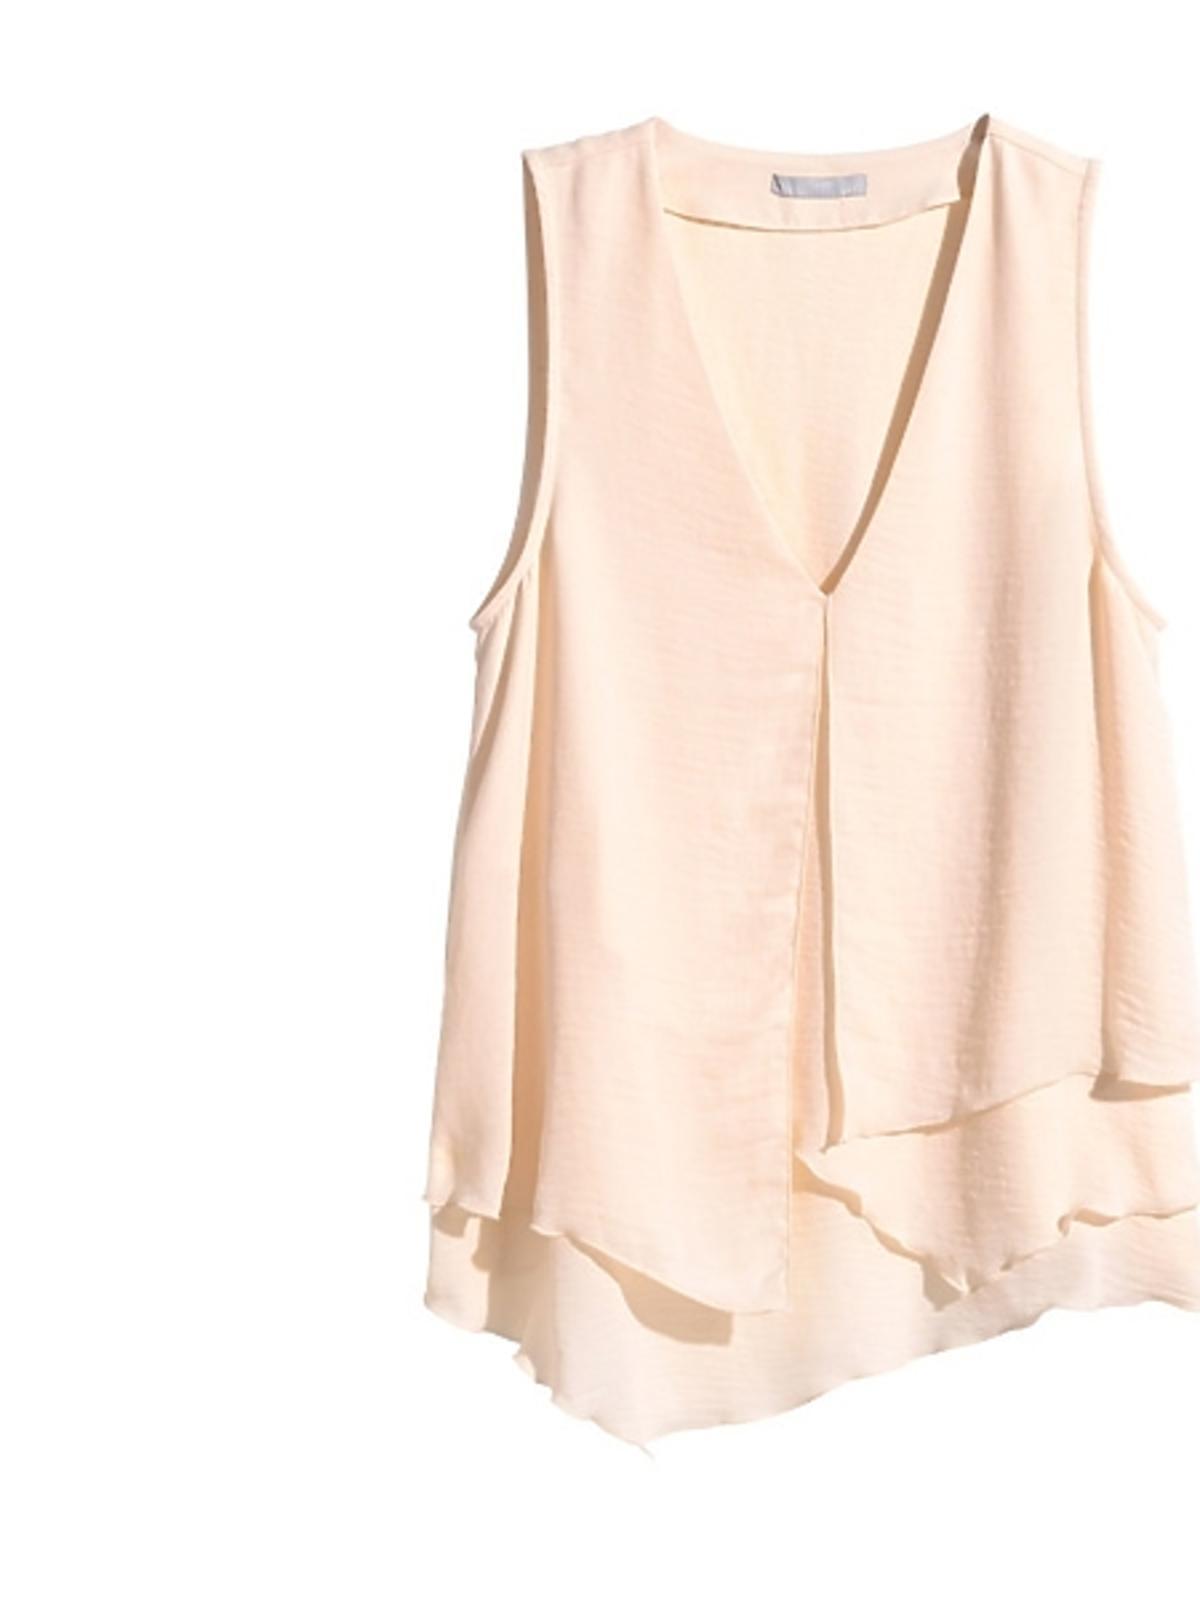 Beżowa bluzka H&M, cena